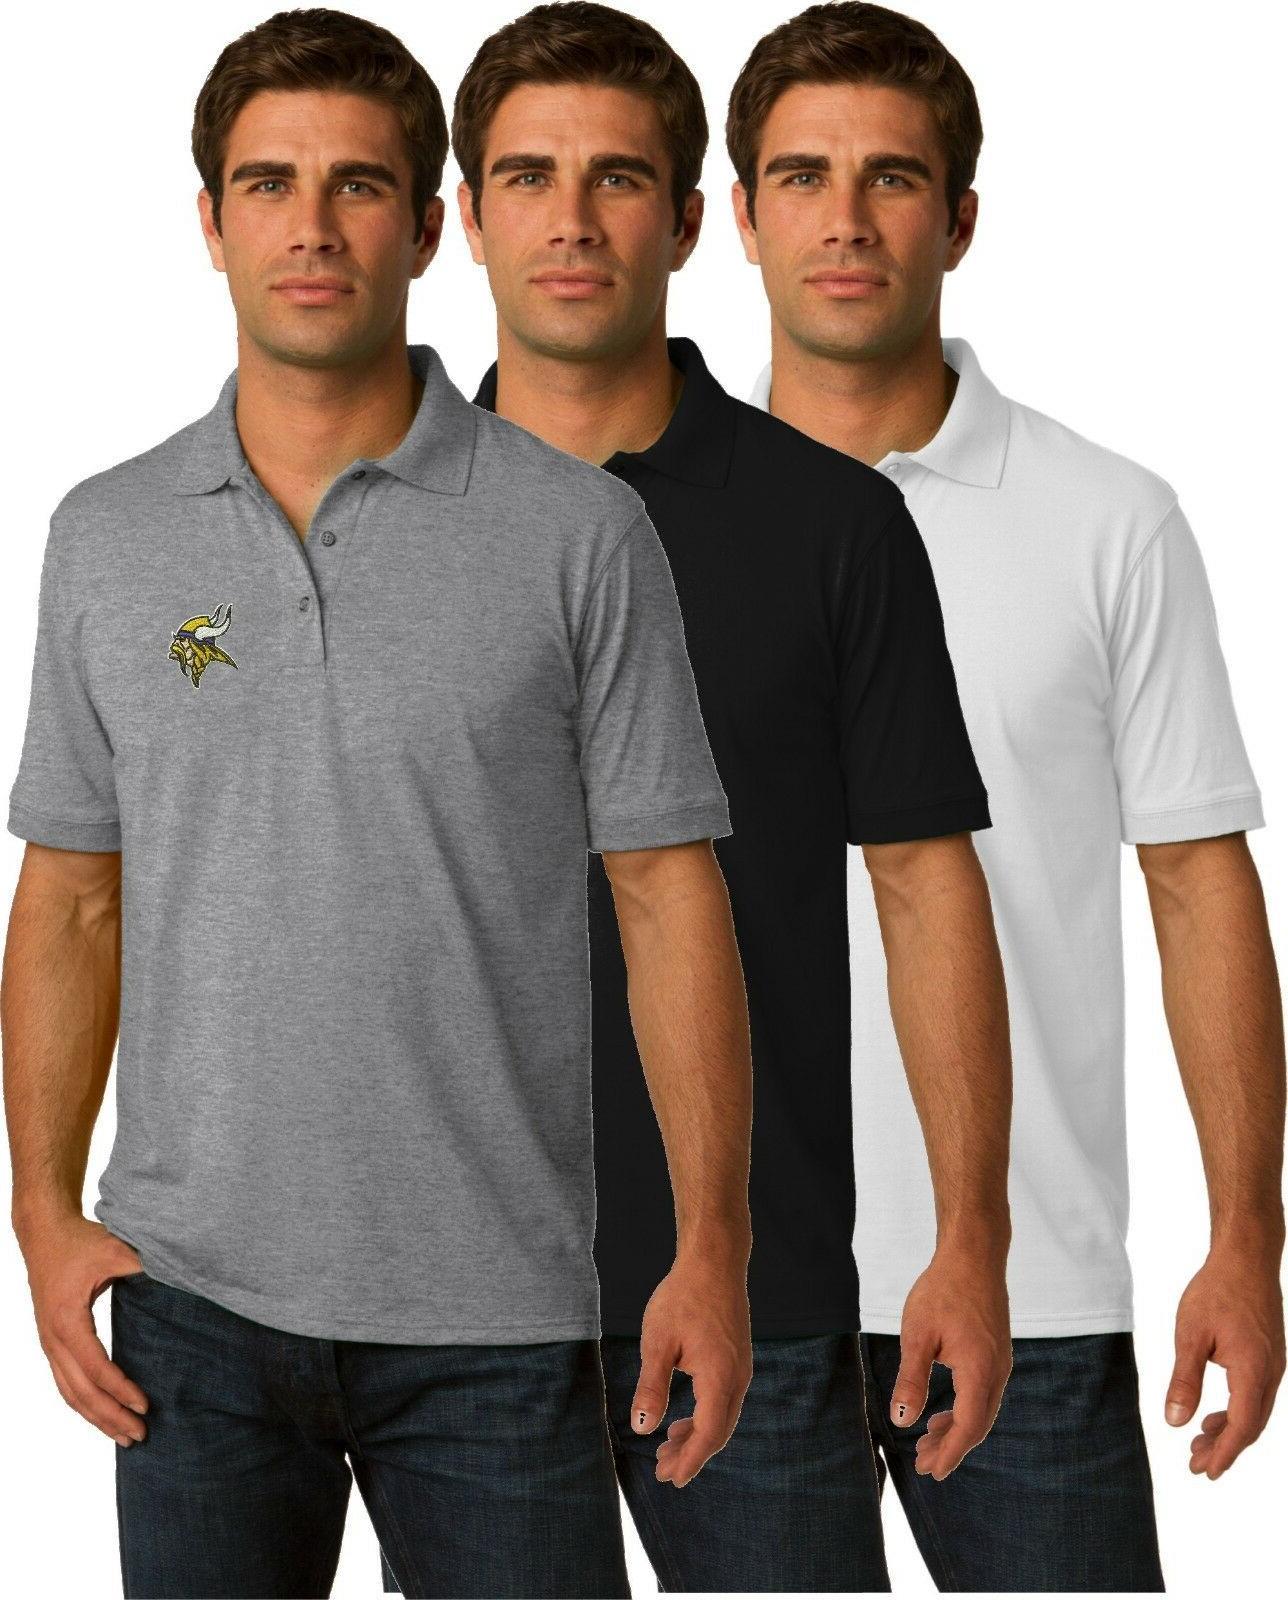 minnesota vikings golf polo shirt up to